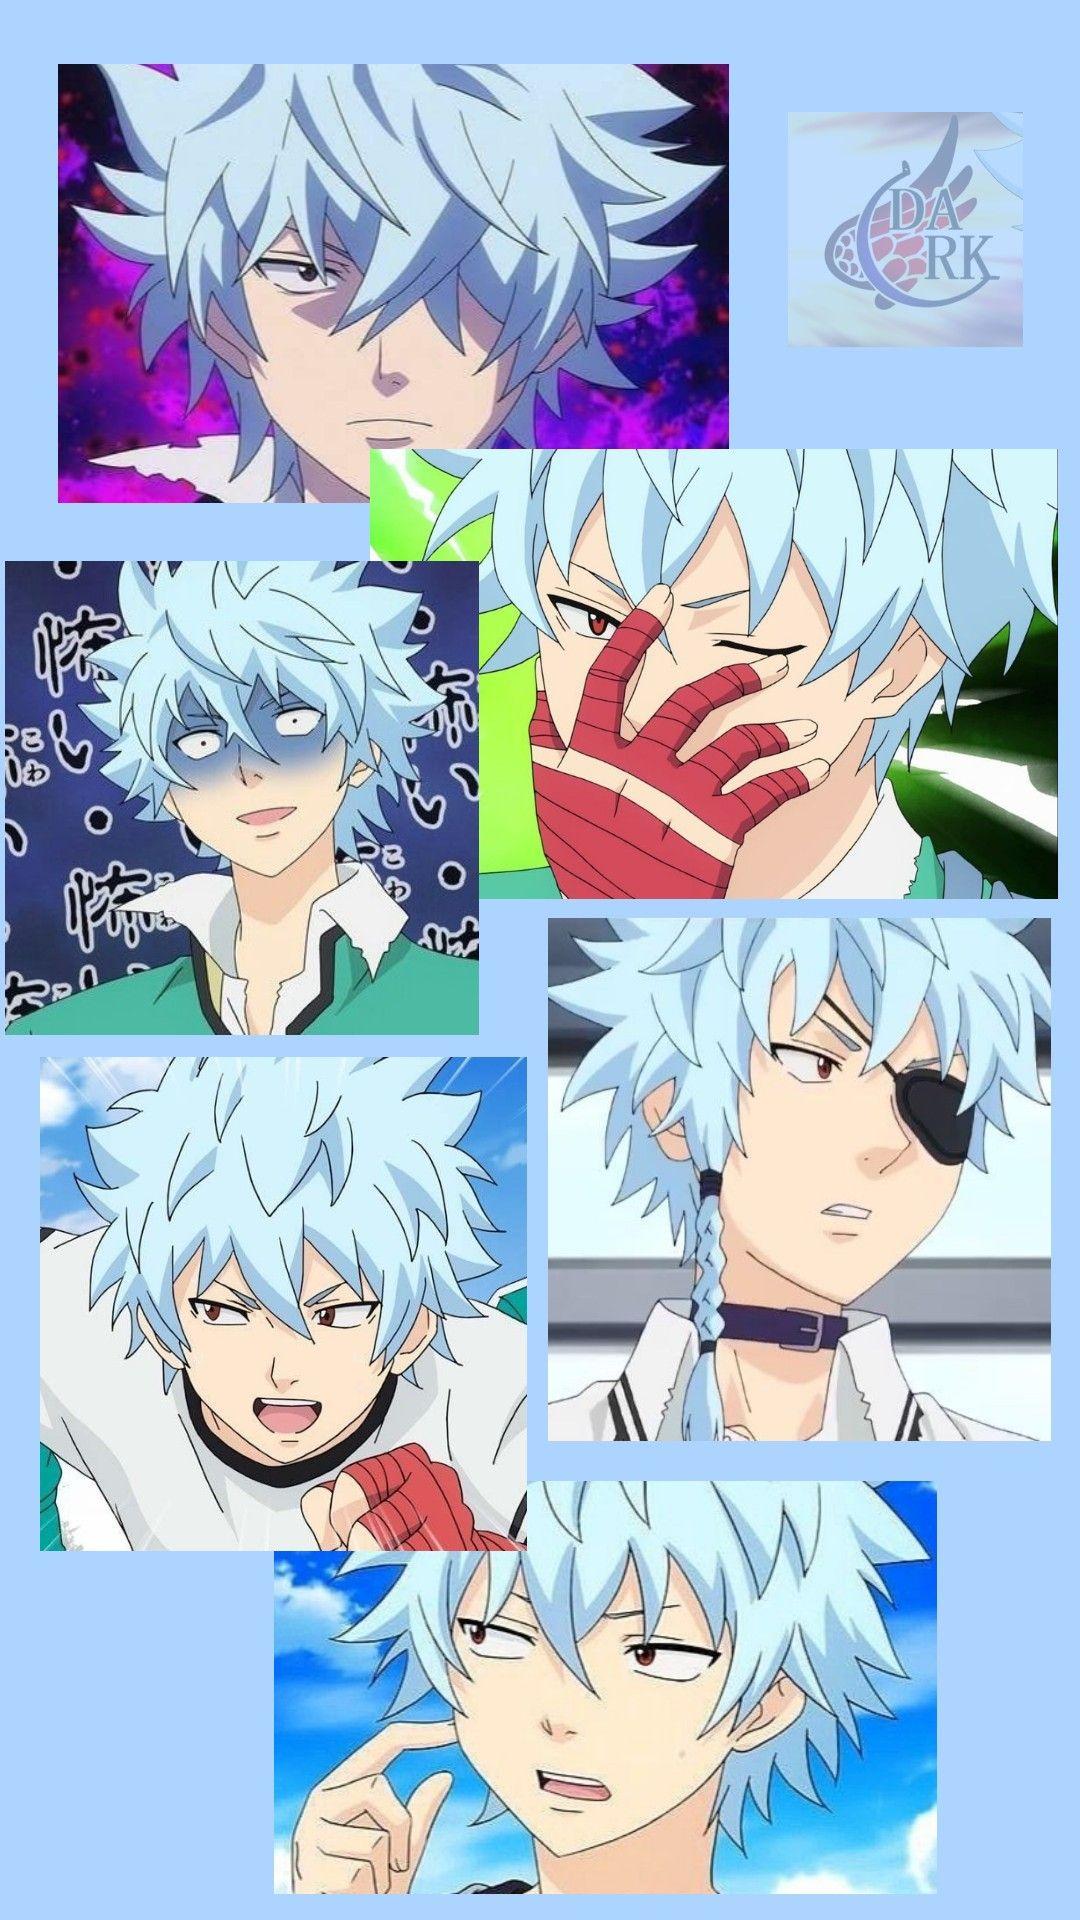 Kaidou Shun Wallpaper The Disastrous Life Of Saiki K Anime Wallpaper Iphone Cute Boy Wallpaper Saiki